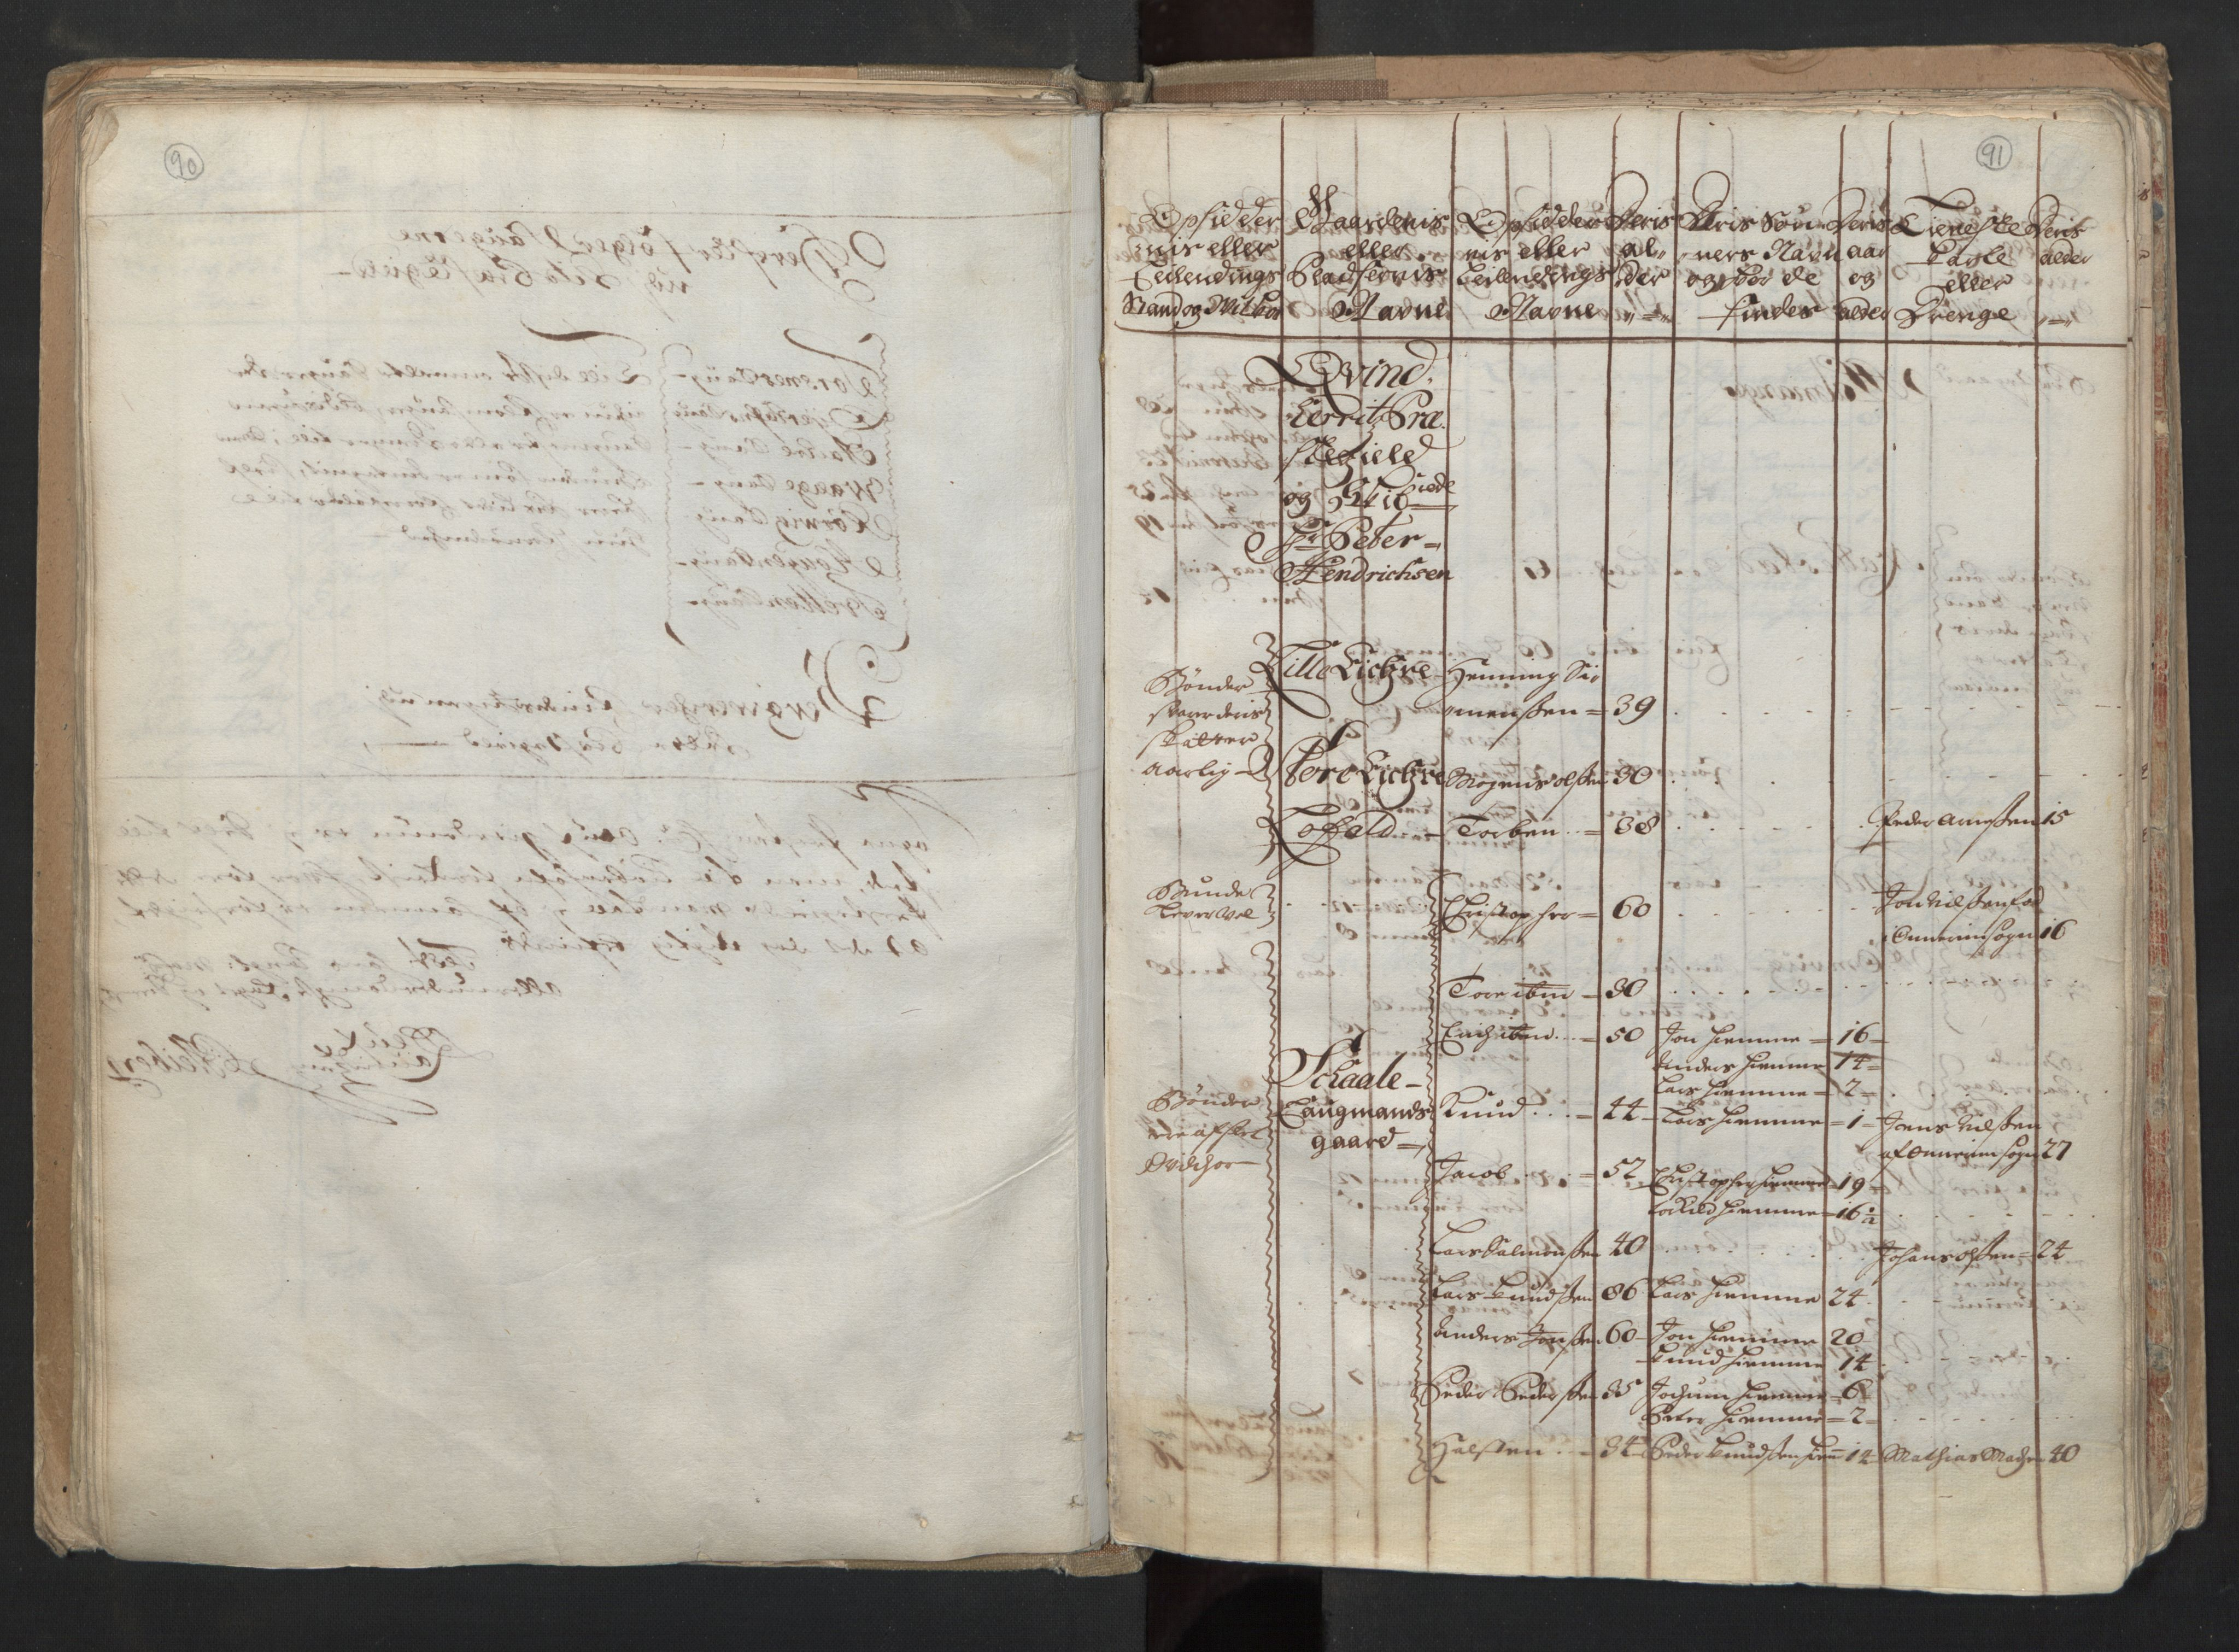 RA, Manntallet 1701, nr. 6: Sunnhordland fogderi og Hardanger fogderi, 1701, s. 90-91